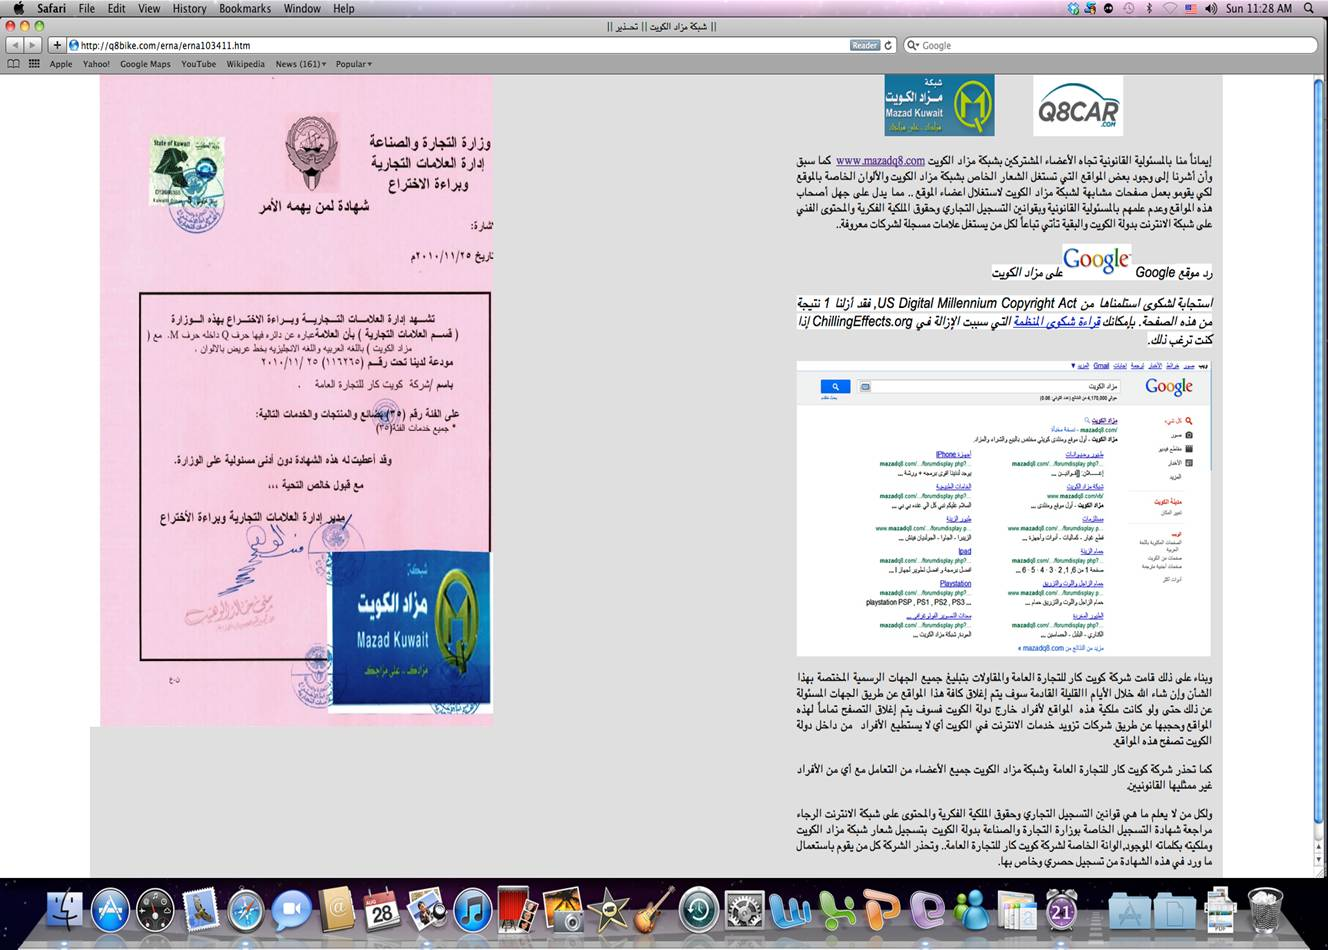 kuwaits auction website and logo plagiarism warning anubisSafari Op Maat.htm #14